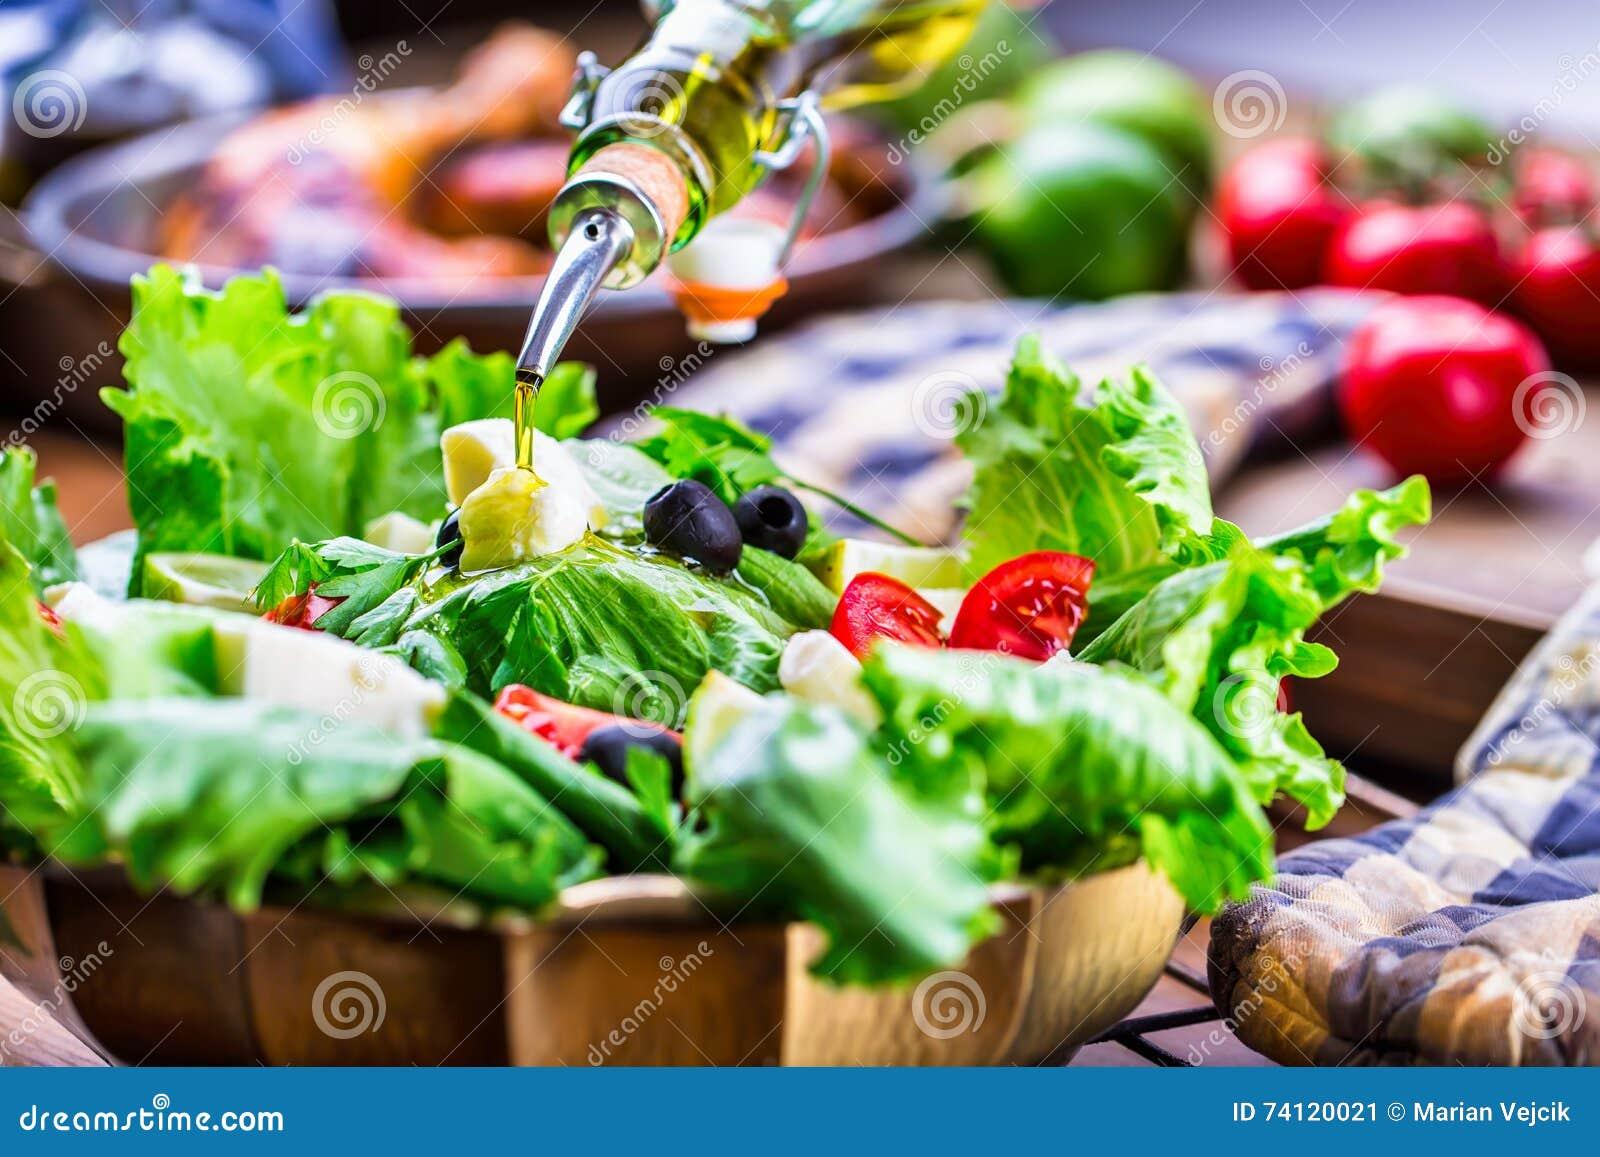 Vegetable lettuce salad. Olive oil pouring into bowl of salad. Italian Mediterranean or Greek cuisine. Vegetarian vegan food